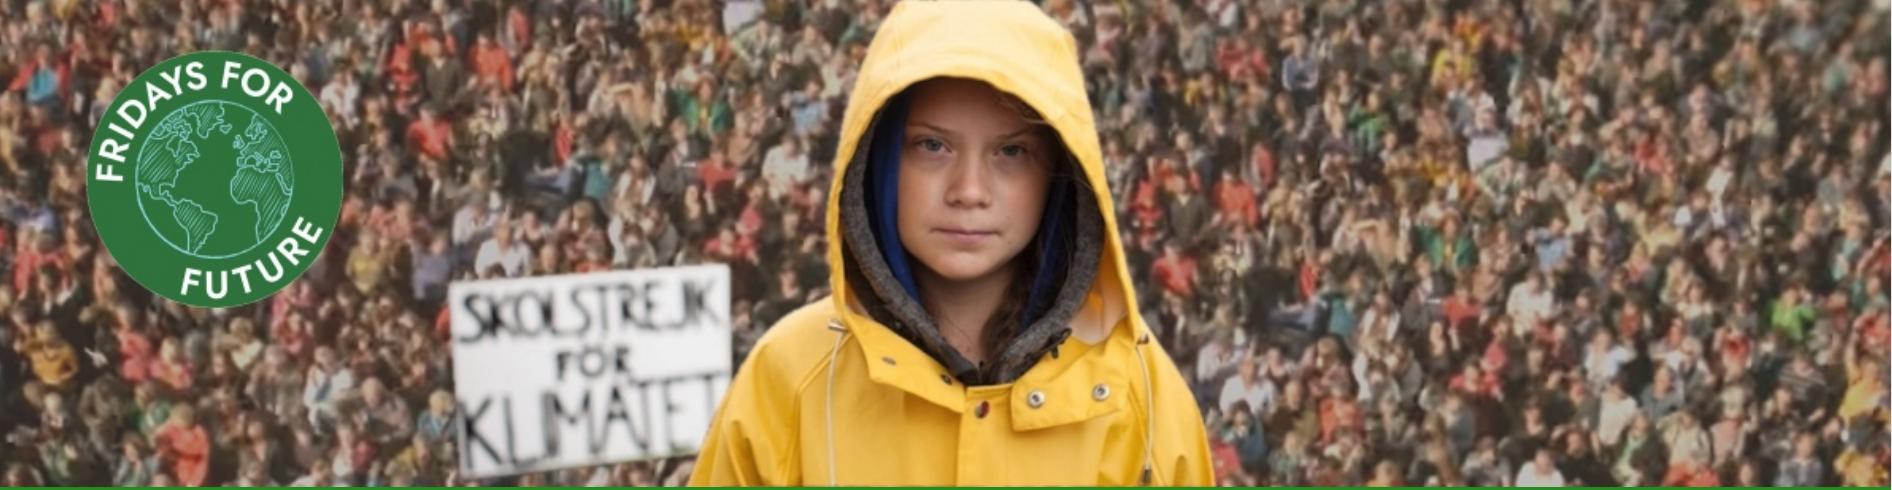 Greta Thunberg ©www.fridaysforfuture.org